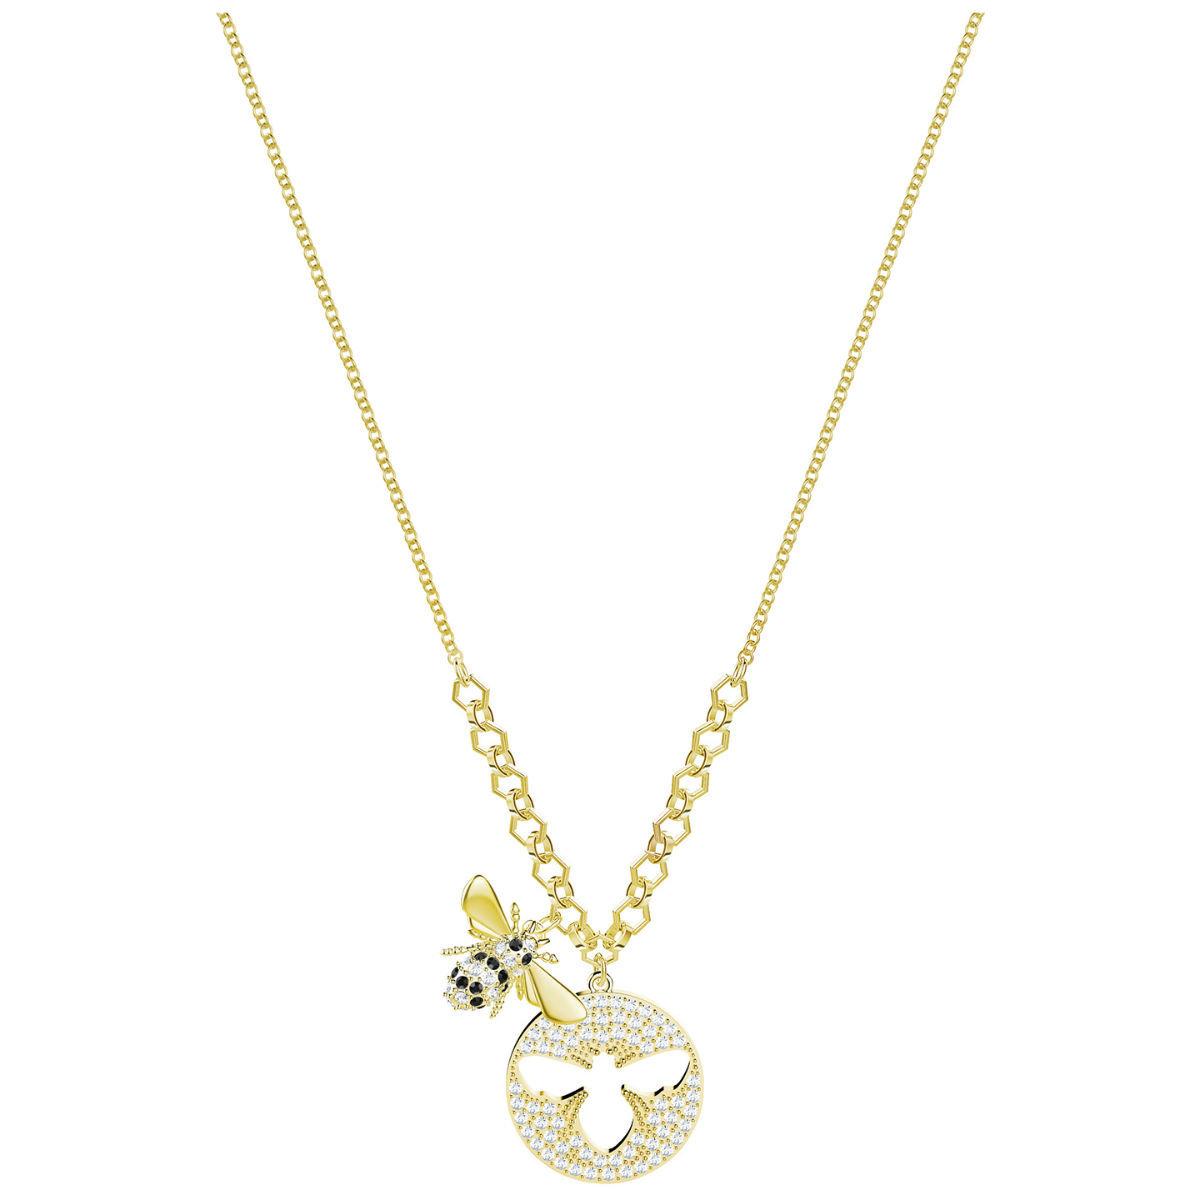 Necklaces - Lisabel Necklace - 5365641 (Parallel Import Goods)